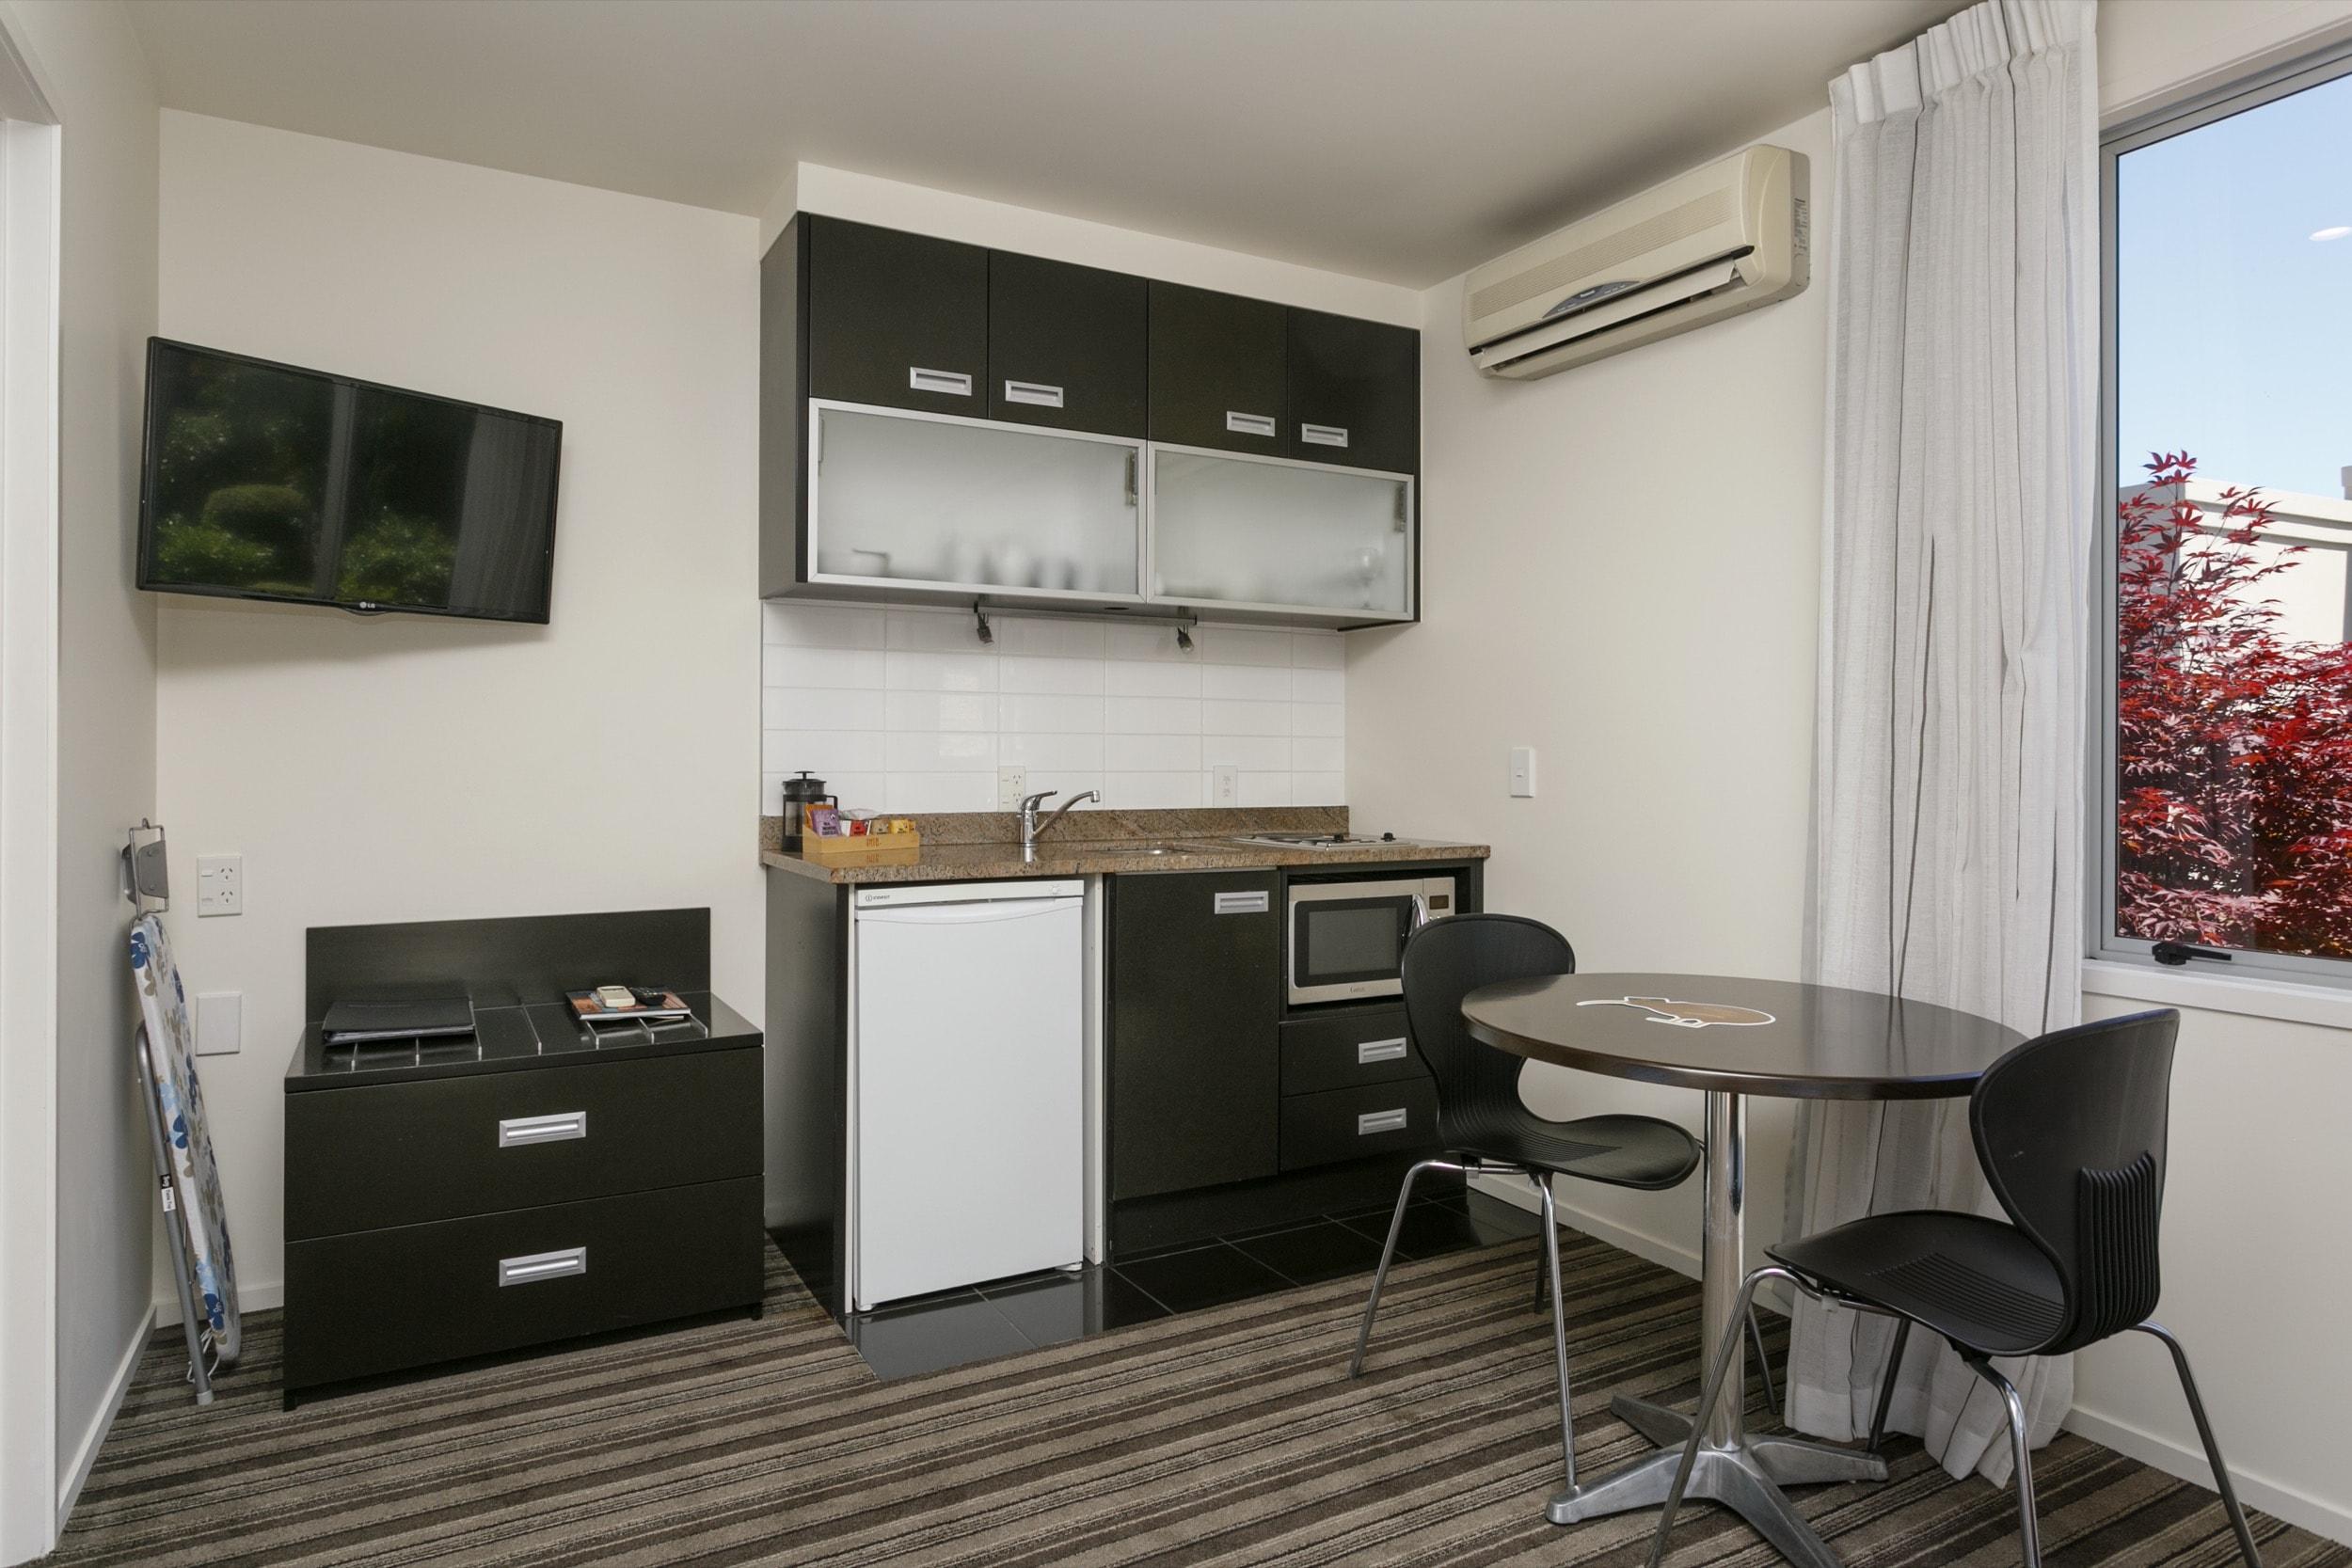 One Bedroom Gardev View living area looking at kitchenette-min.jpg